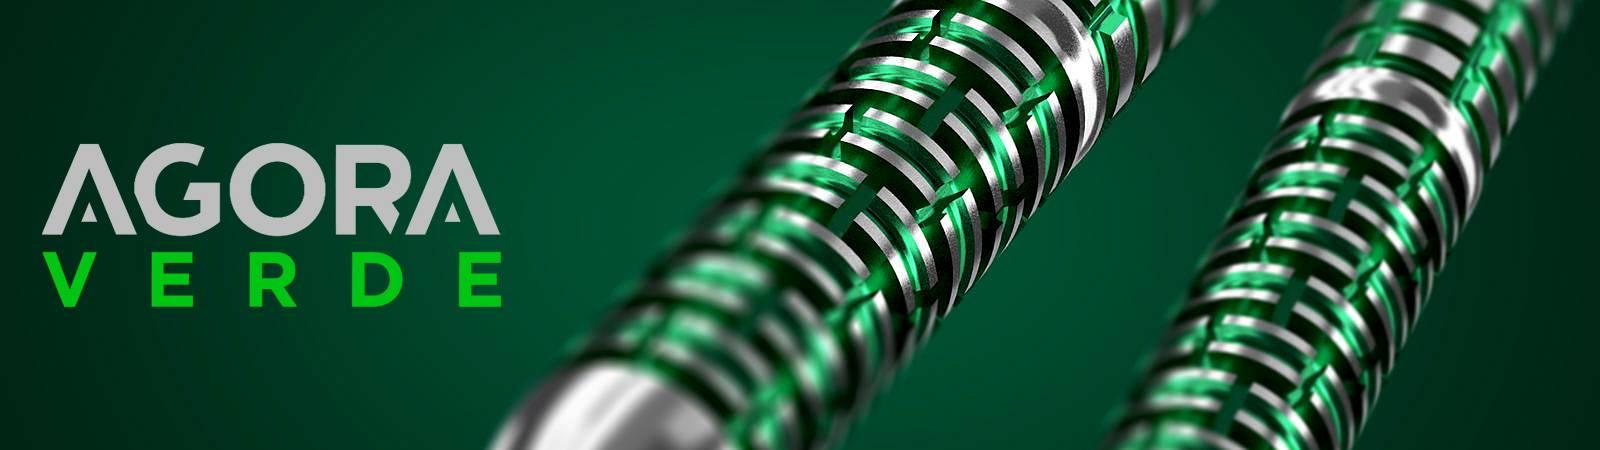 Target Agora Verde Steeldarts